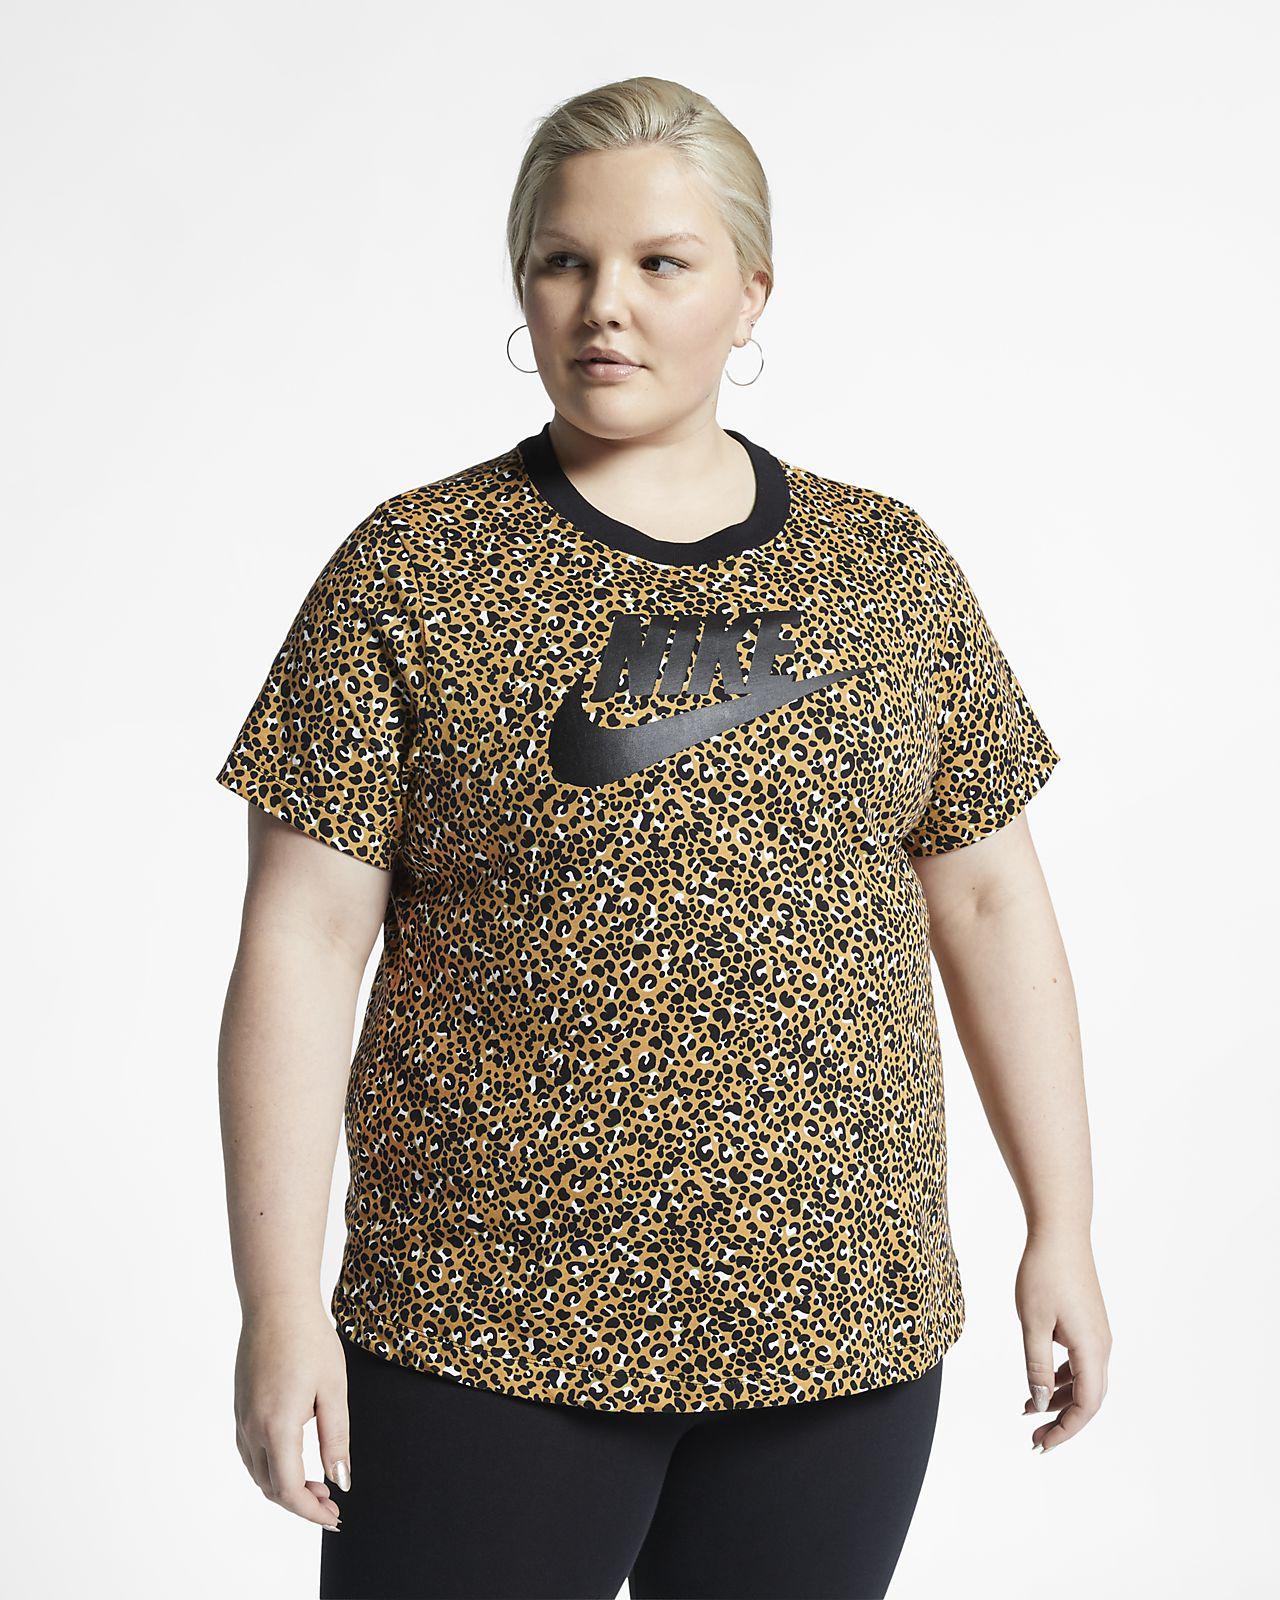 Camiseta de manga corta para mujer (talla grande) Nike Sportswear Animal Print